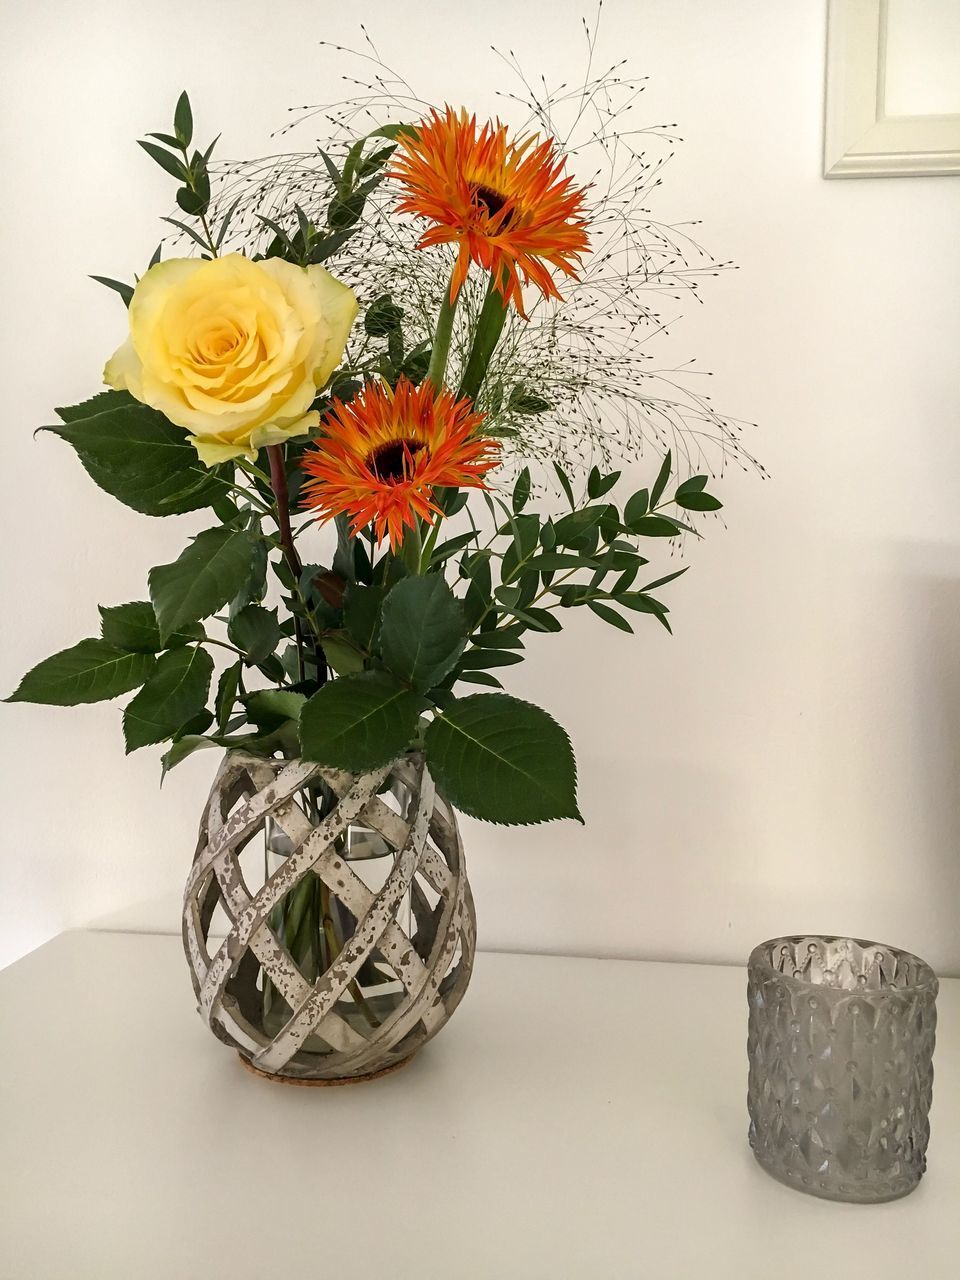 flower, flowering plant, plant, vase, table, nature, flower head, freshness, indoors, beauty in nature, flower arrangement, fragility, decoration, vulnerability, inflorescence, close-up, no people, leaf, petal, plant part, bouquet, bunch of flowers